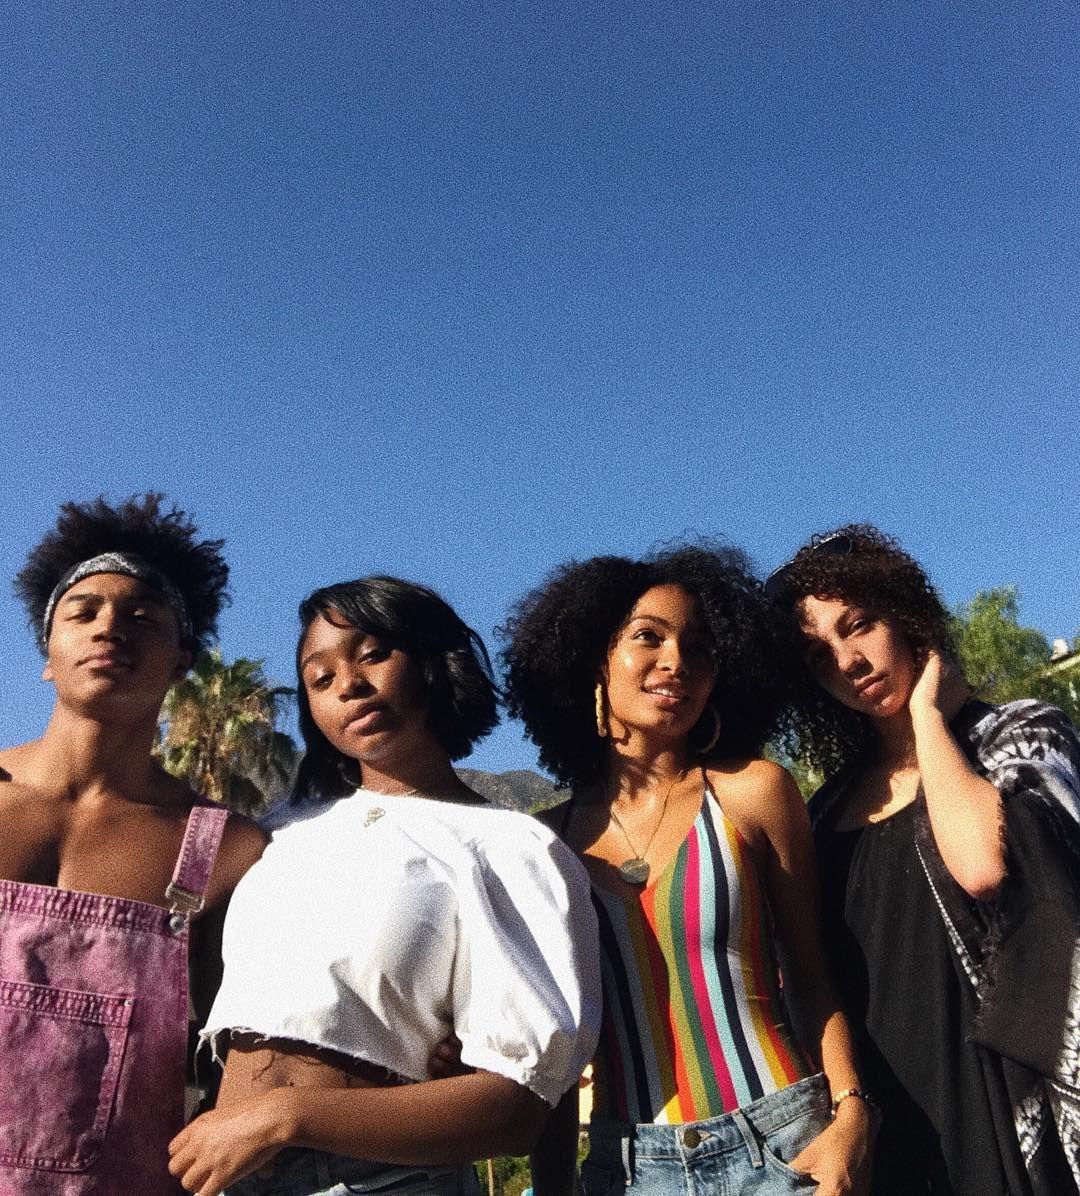 Black Fashion Models Poses: Black Goddess, Model, Instagram Pose